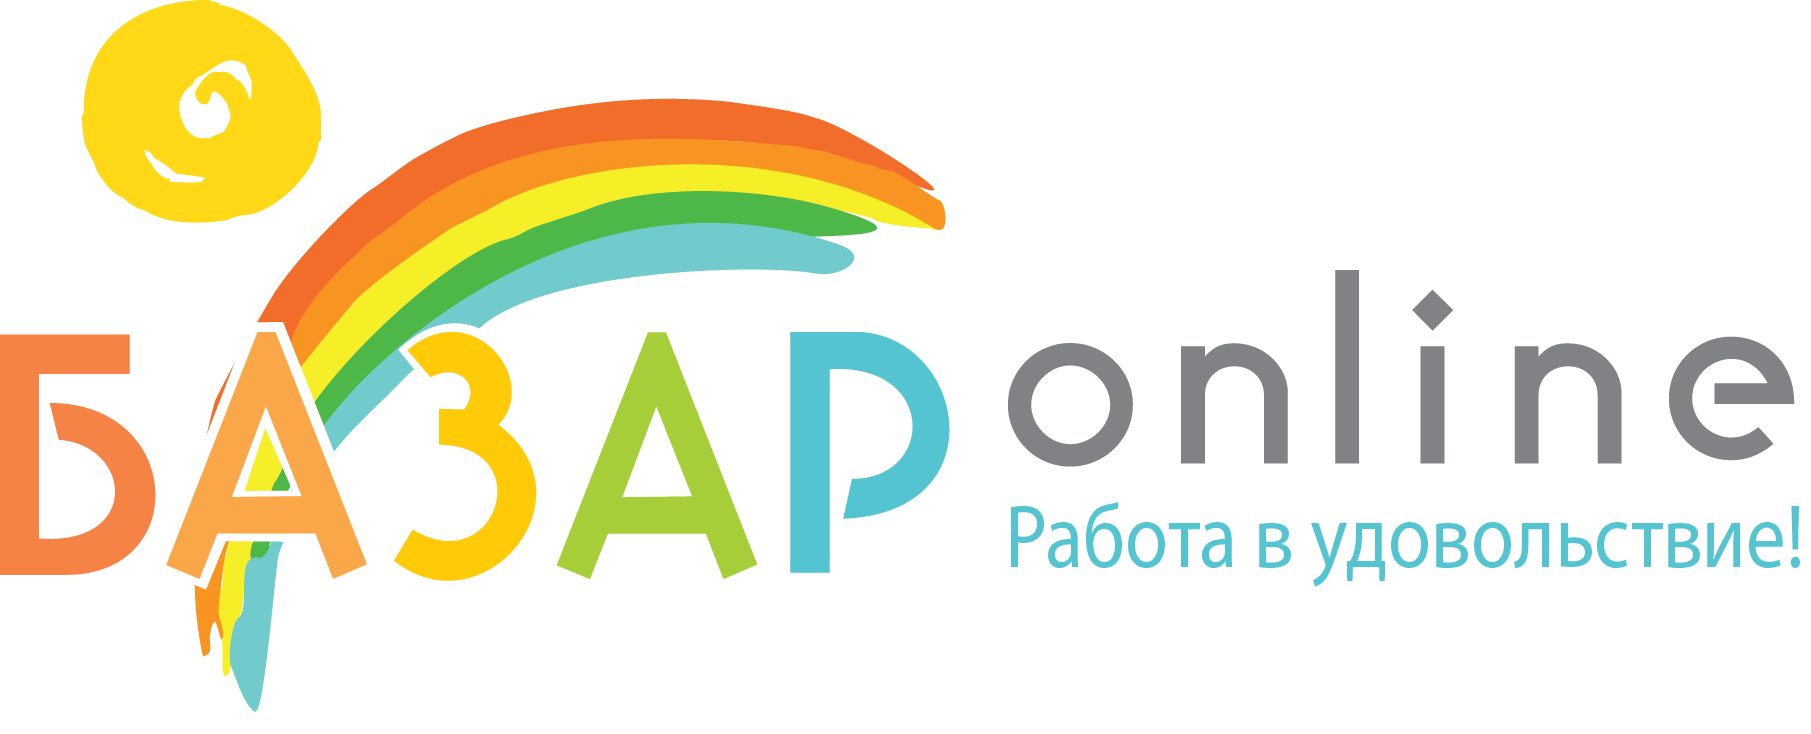 bazaronline